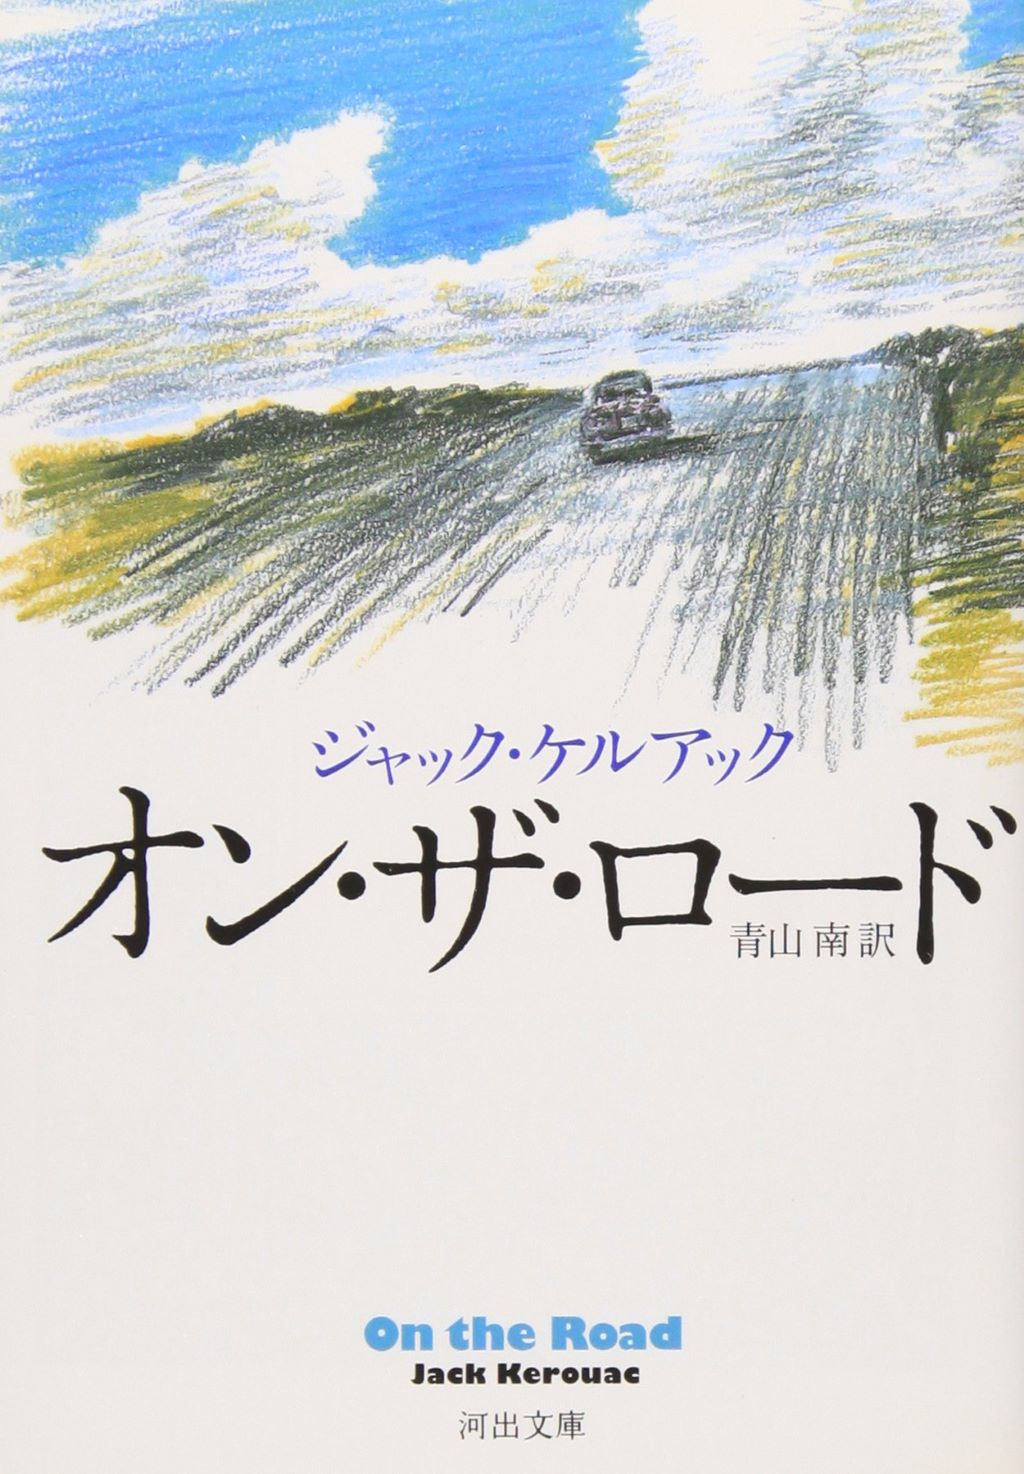 amazarashi新アルバム『ボイコット』――動け、拒絶しろ、先へ行け